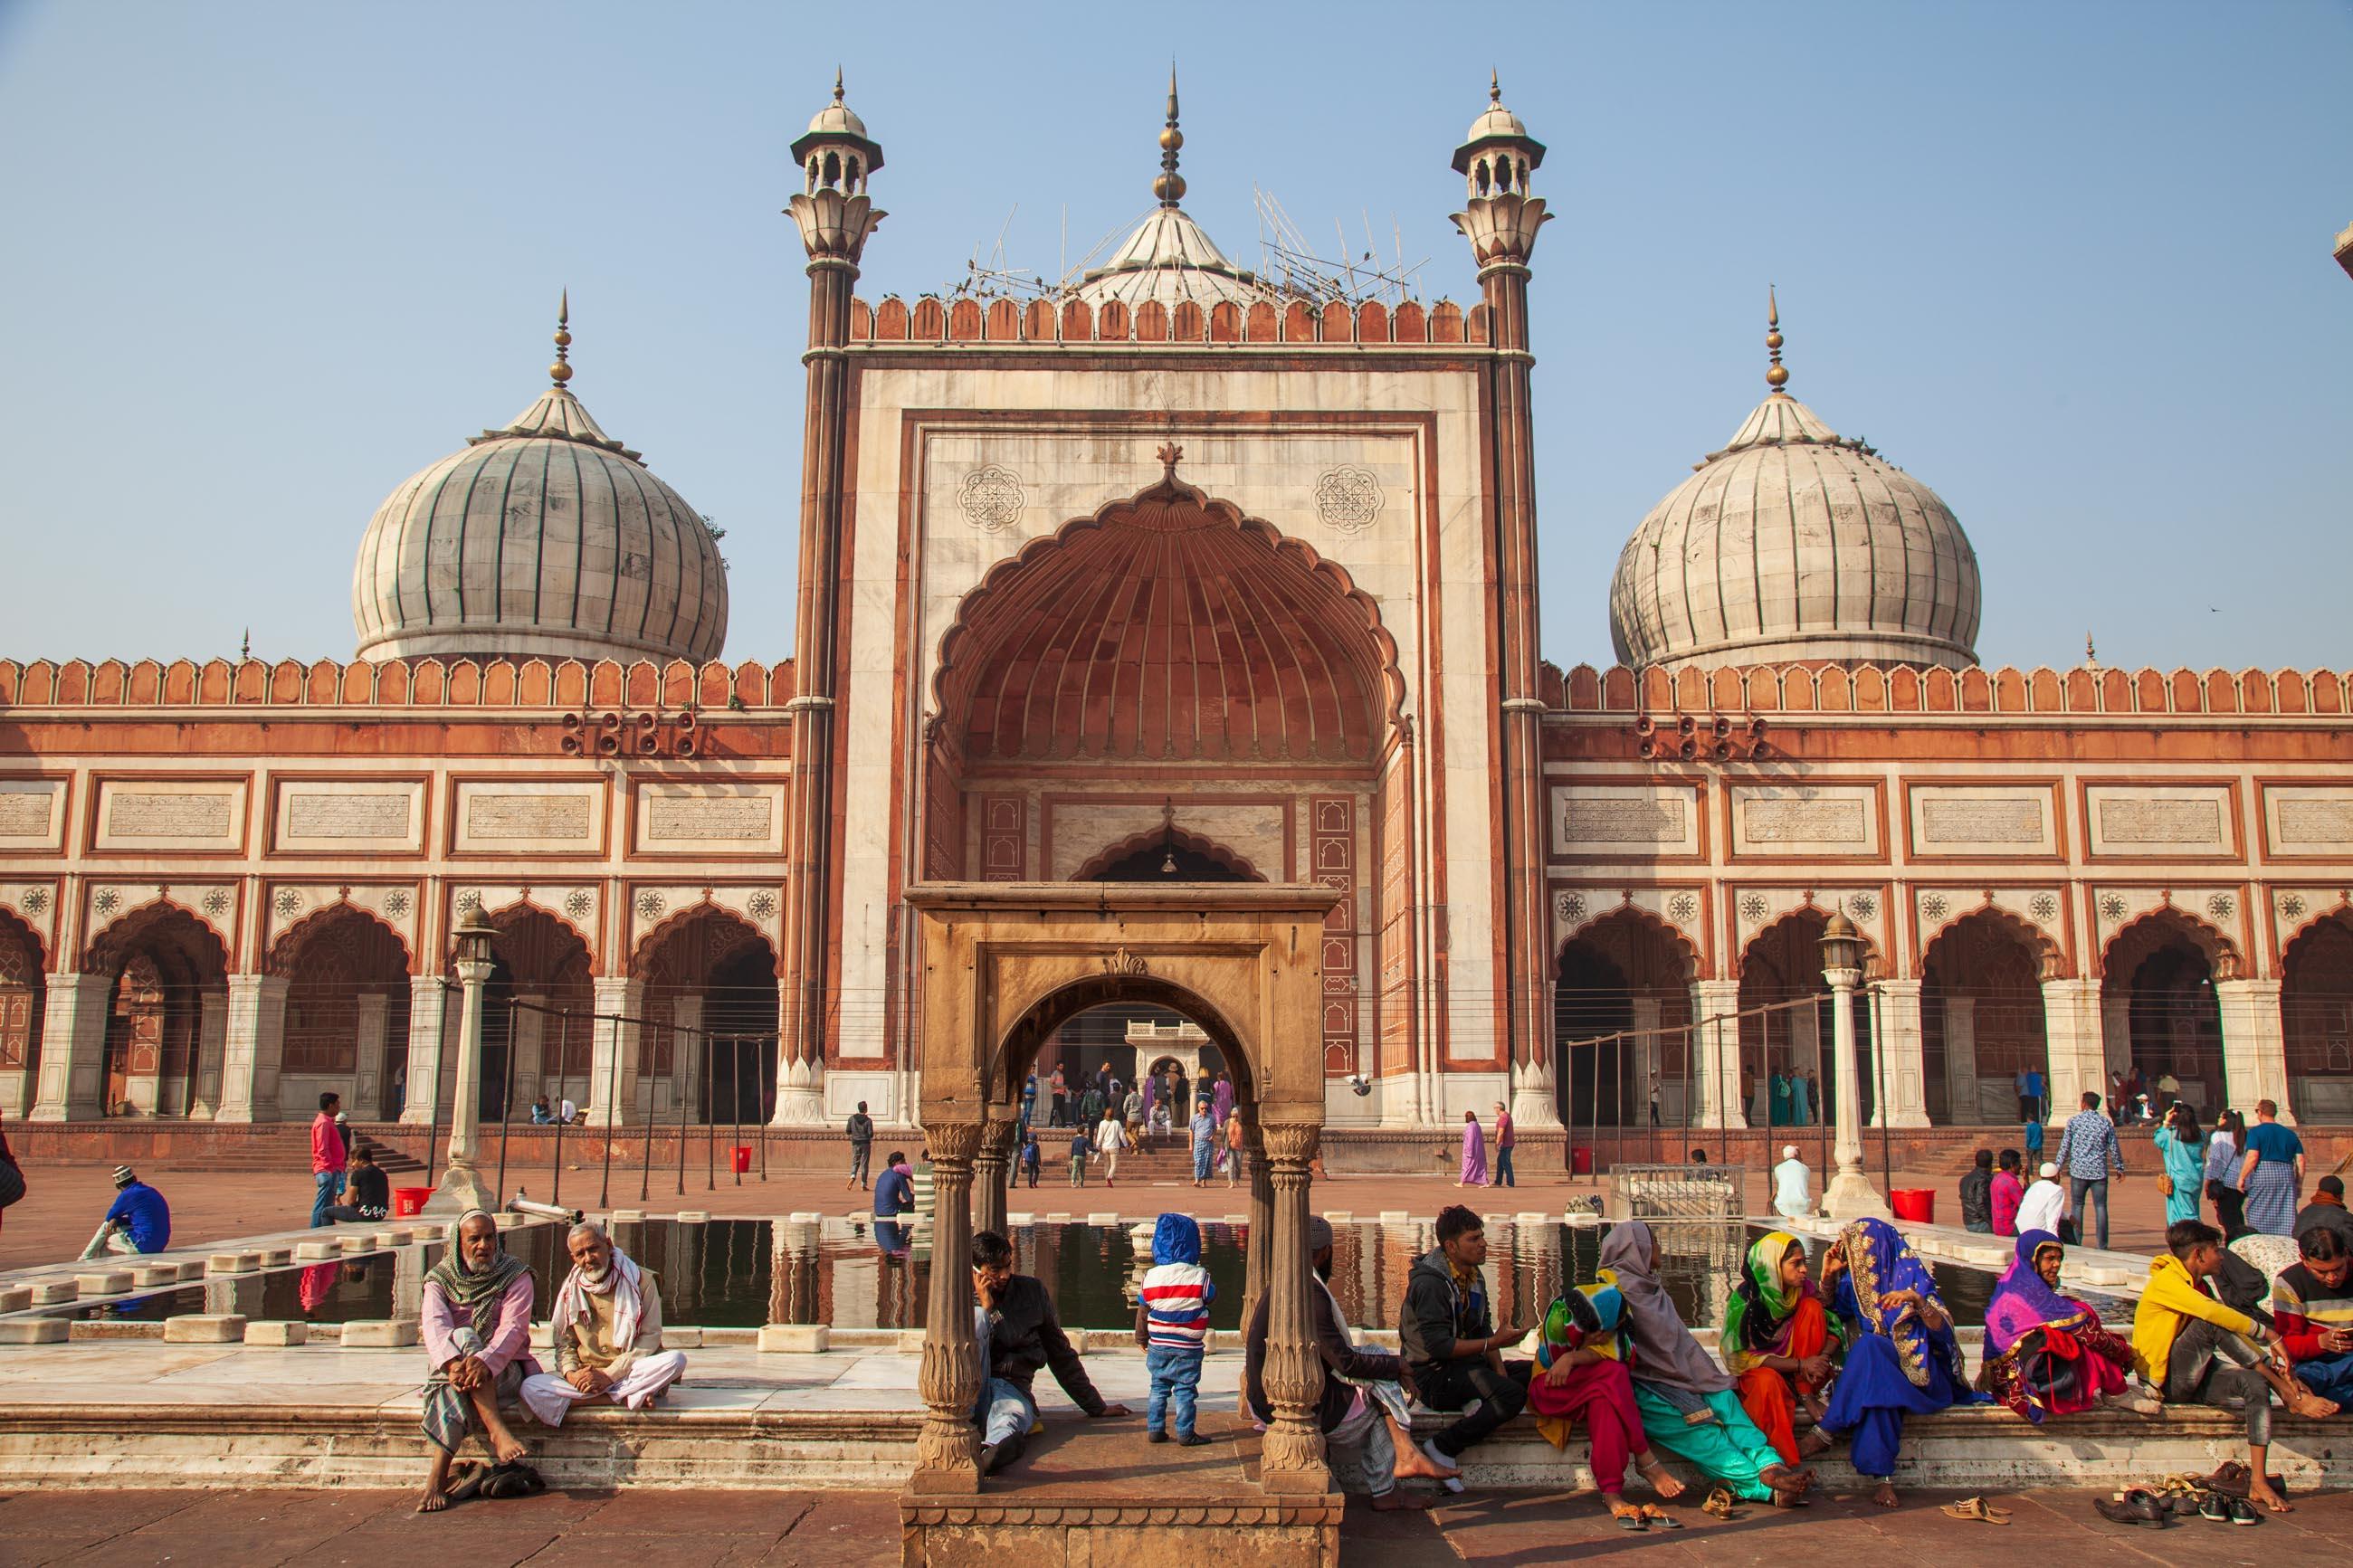 https://bubo.sk/uploads/galleries/15266/samuelklc_india_delhi_jama-masjid_img_0223.jpg